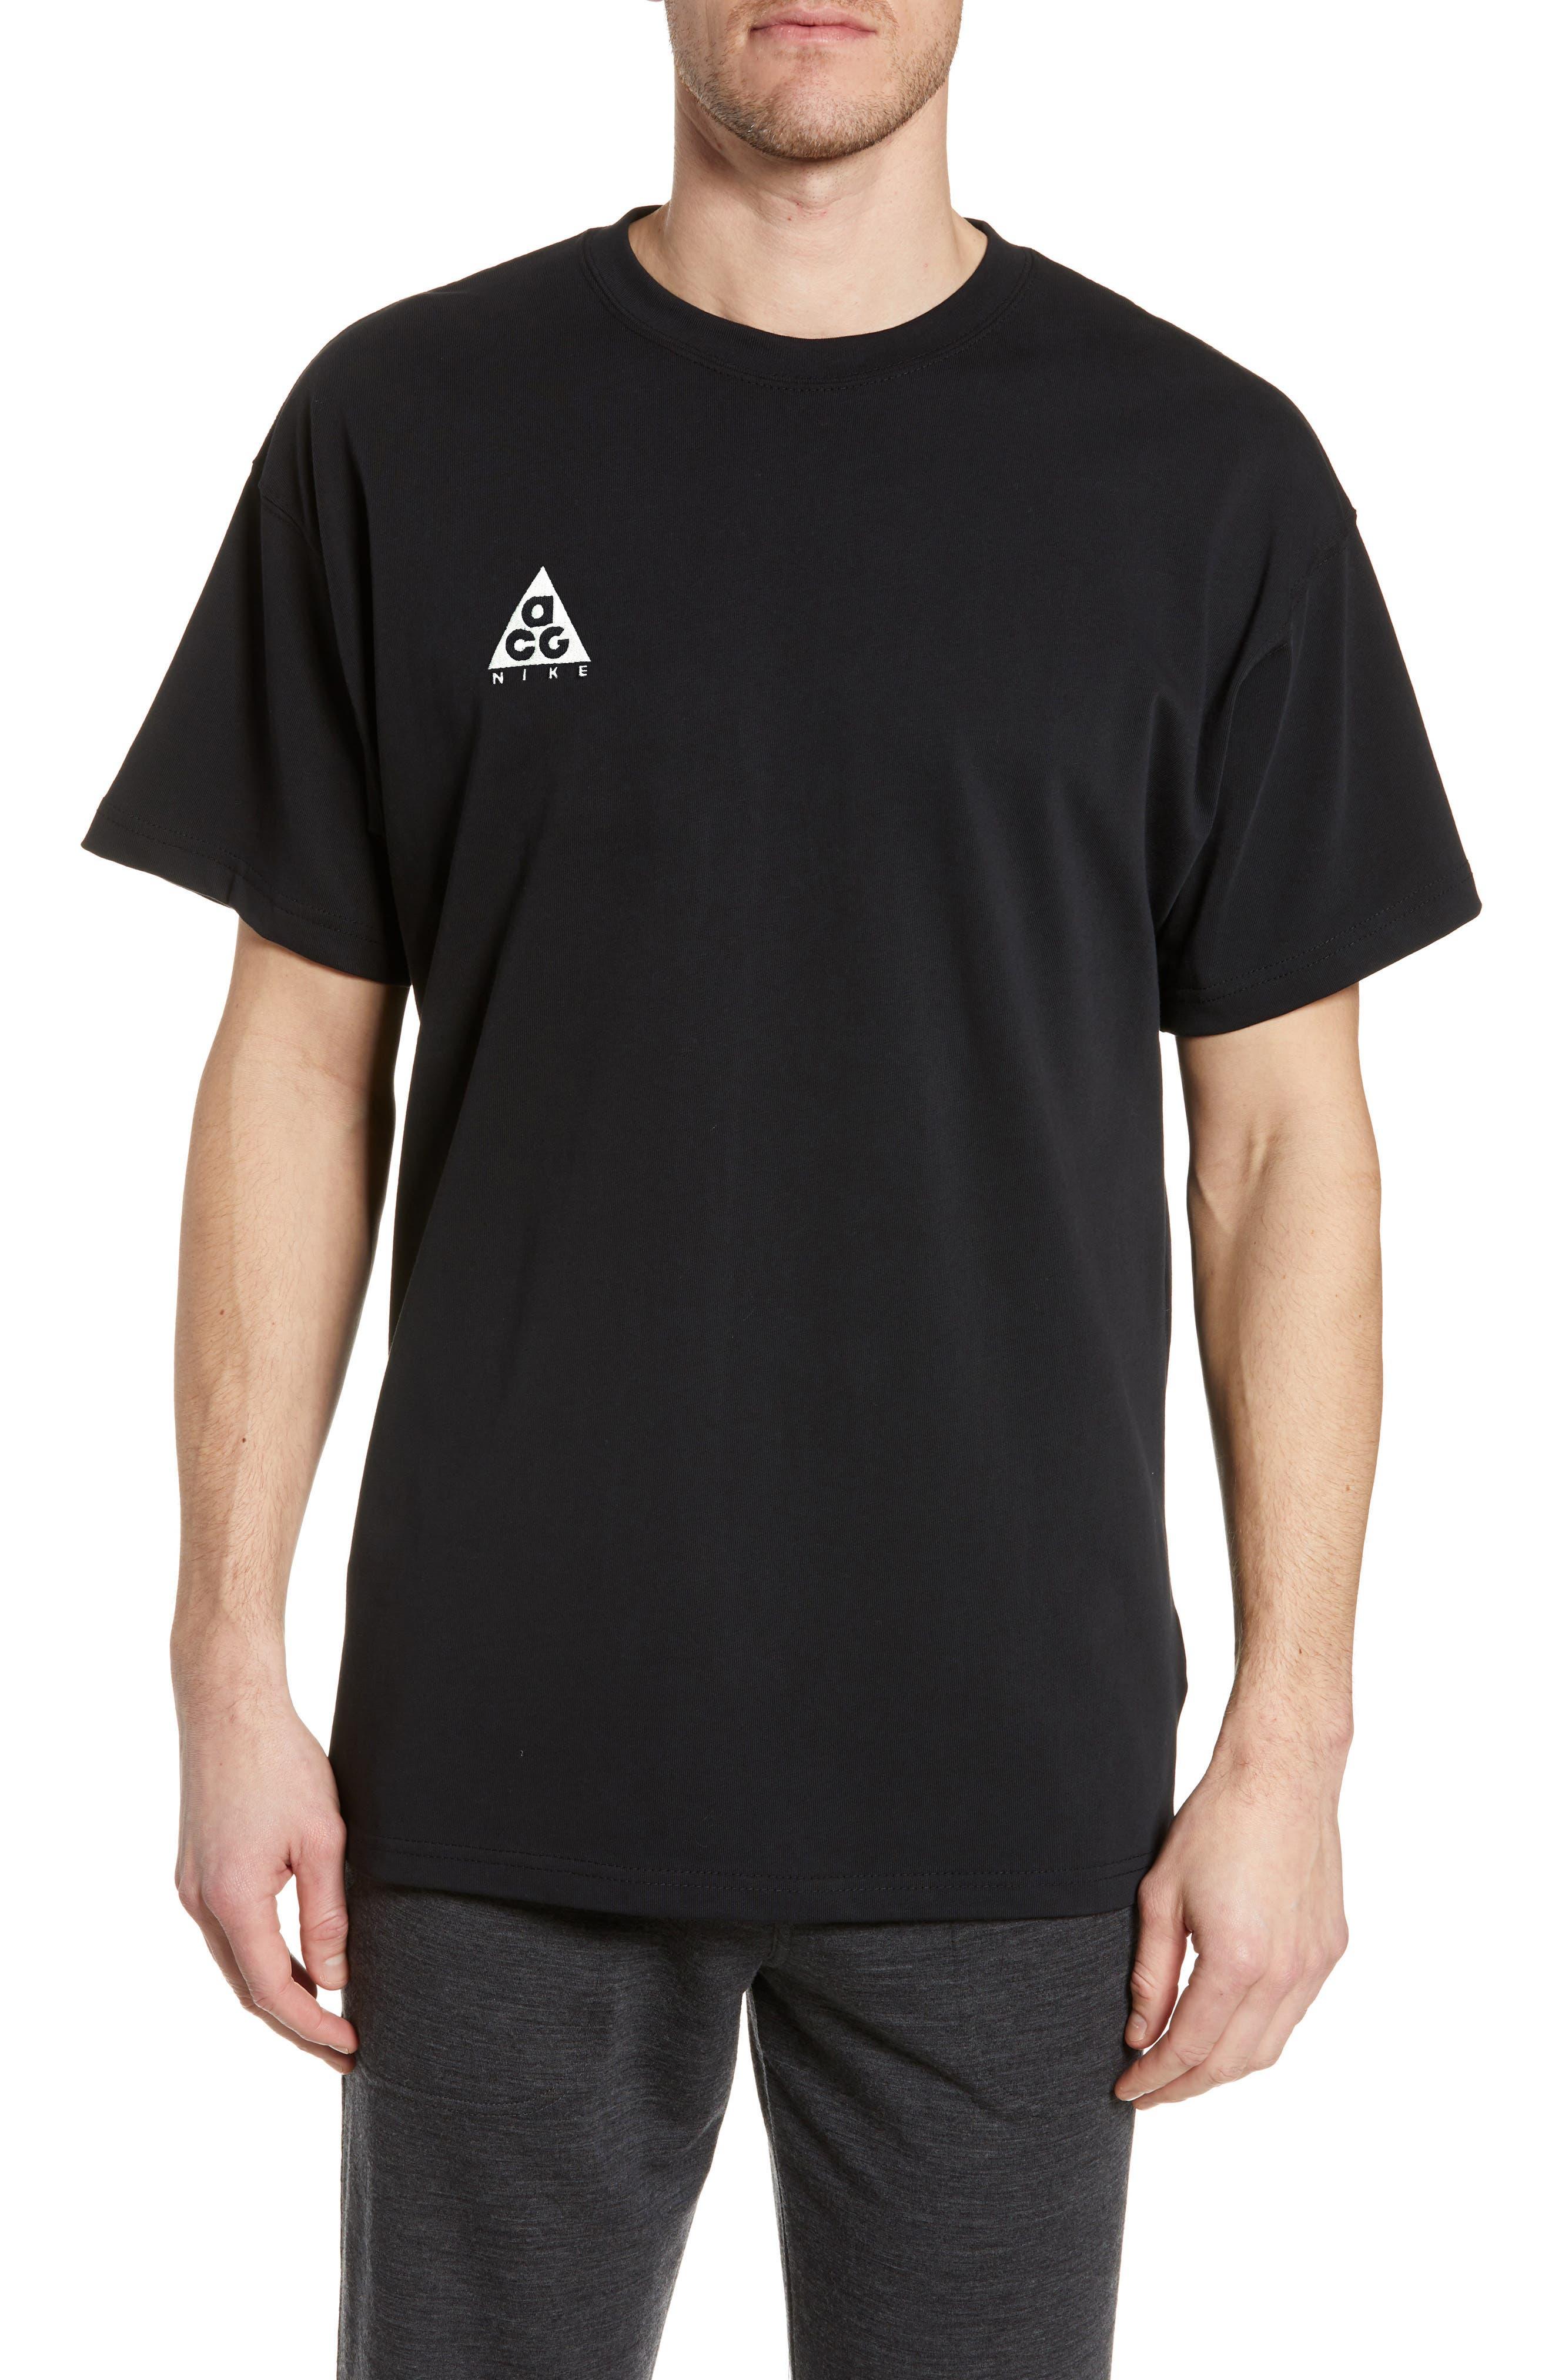 Nike Nrg All Conditions Gear Logo T-Shirt, Black